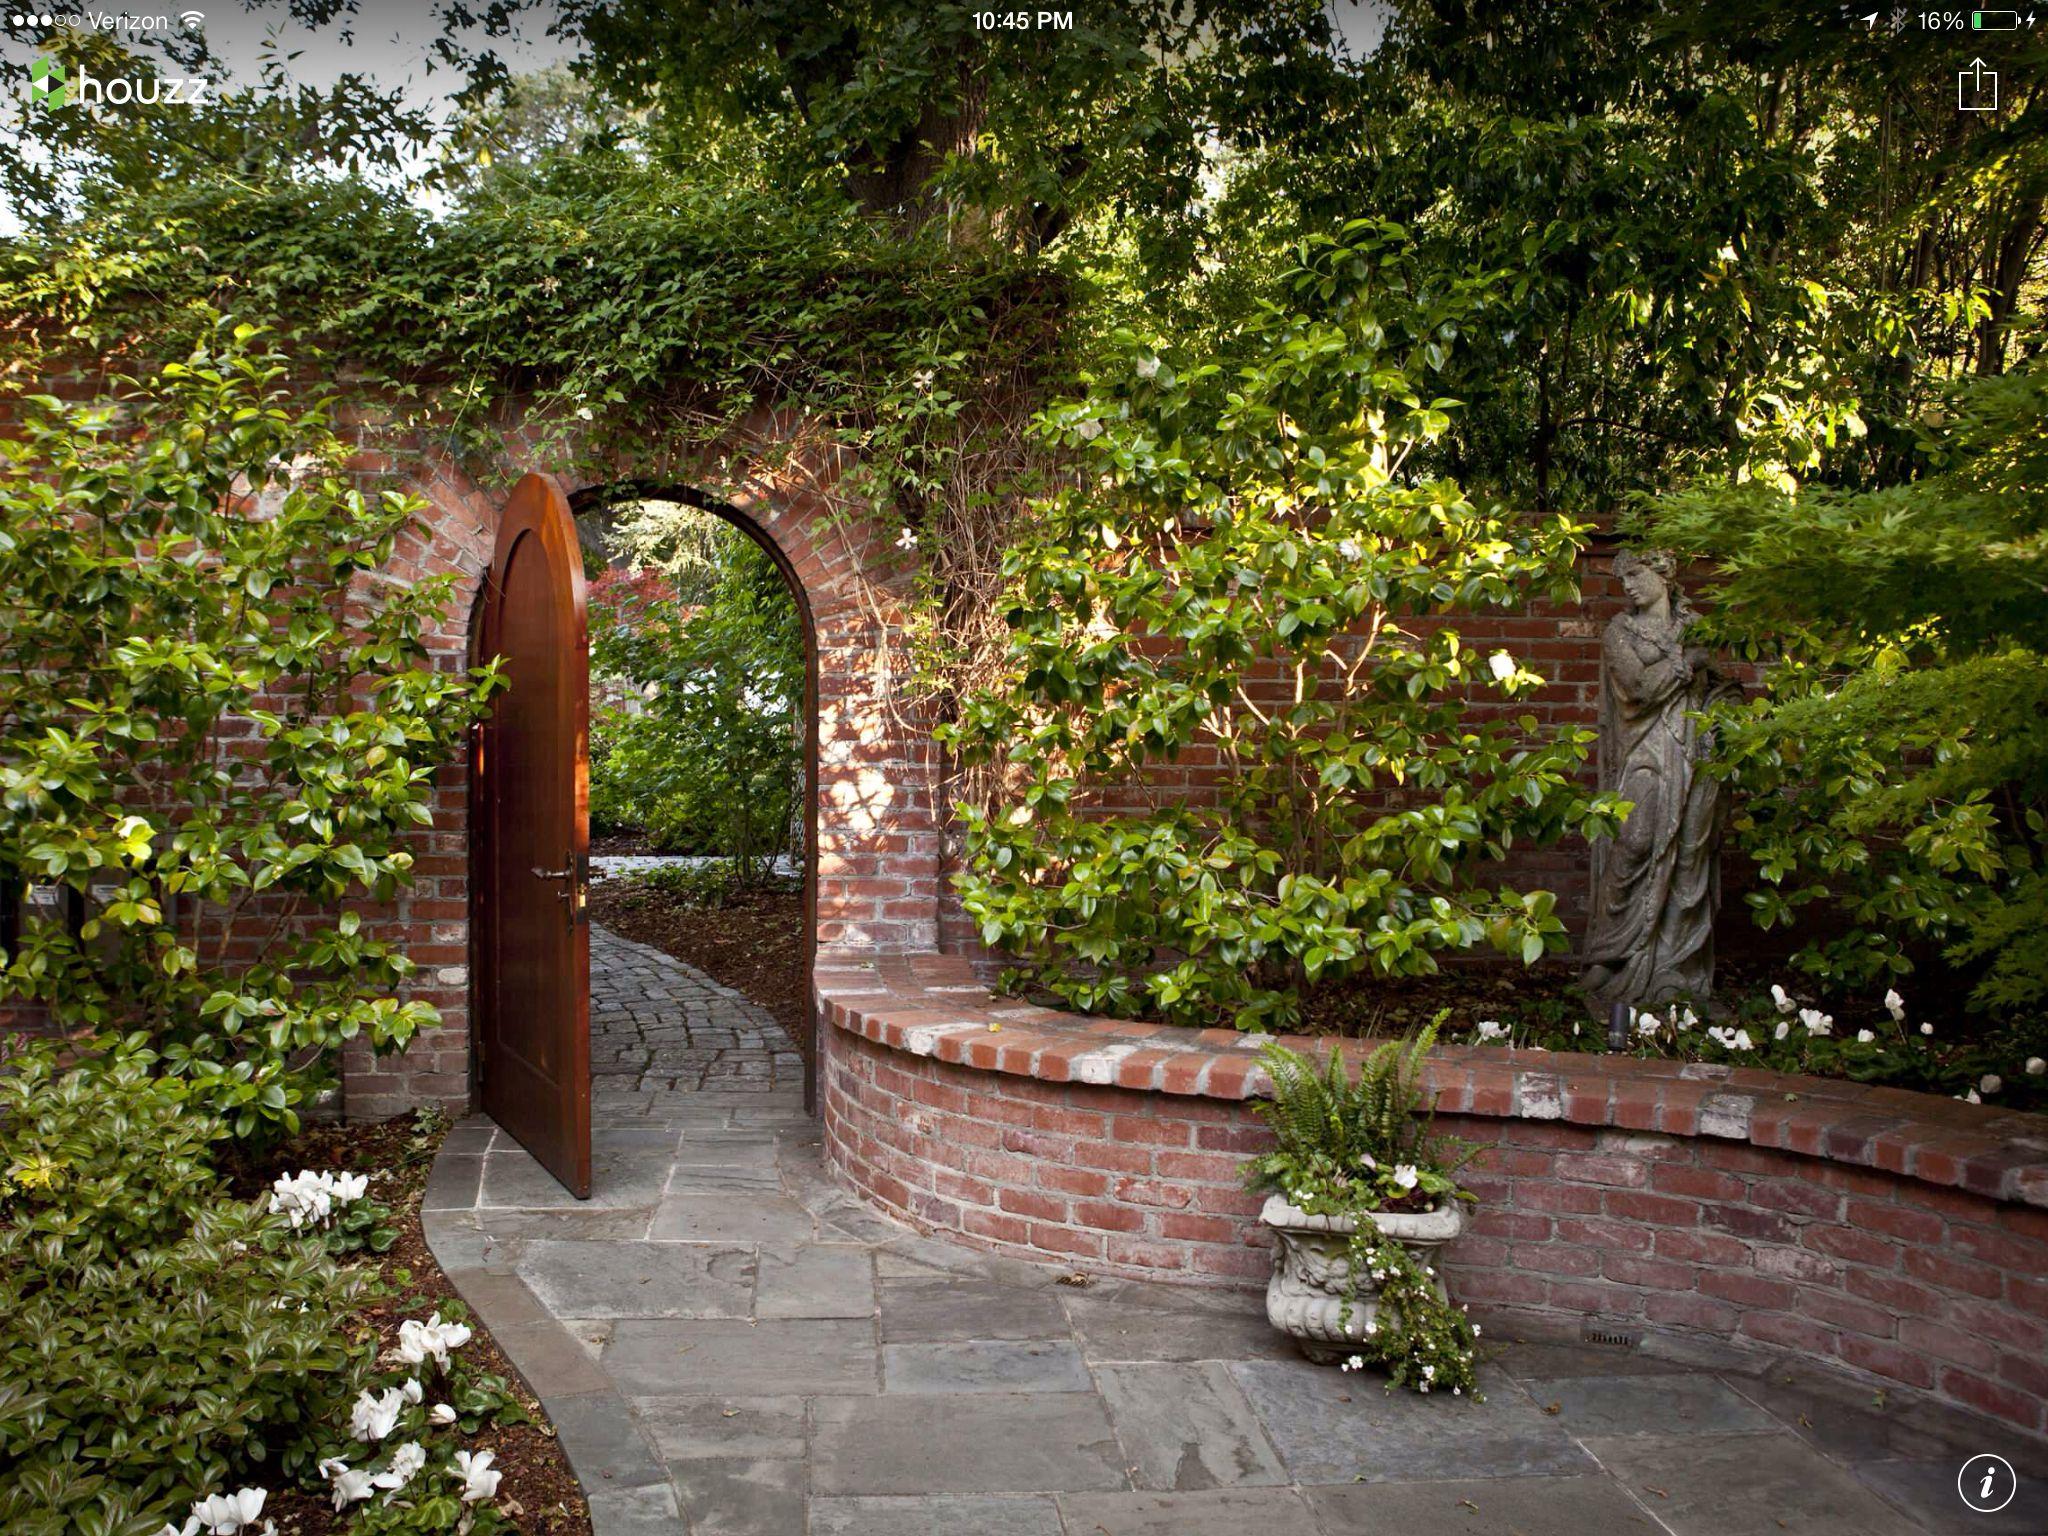 Brick Garden Wall | Landscape | Pinterest | Bricks, Gardens and Walls